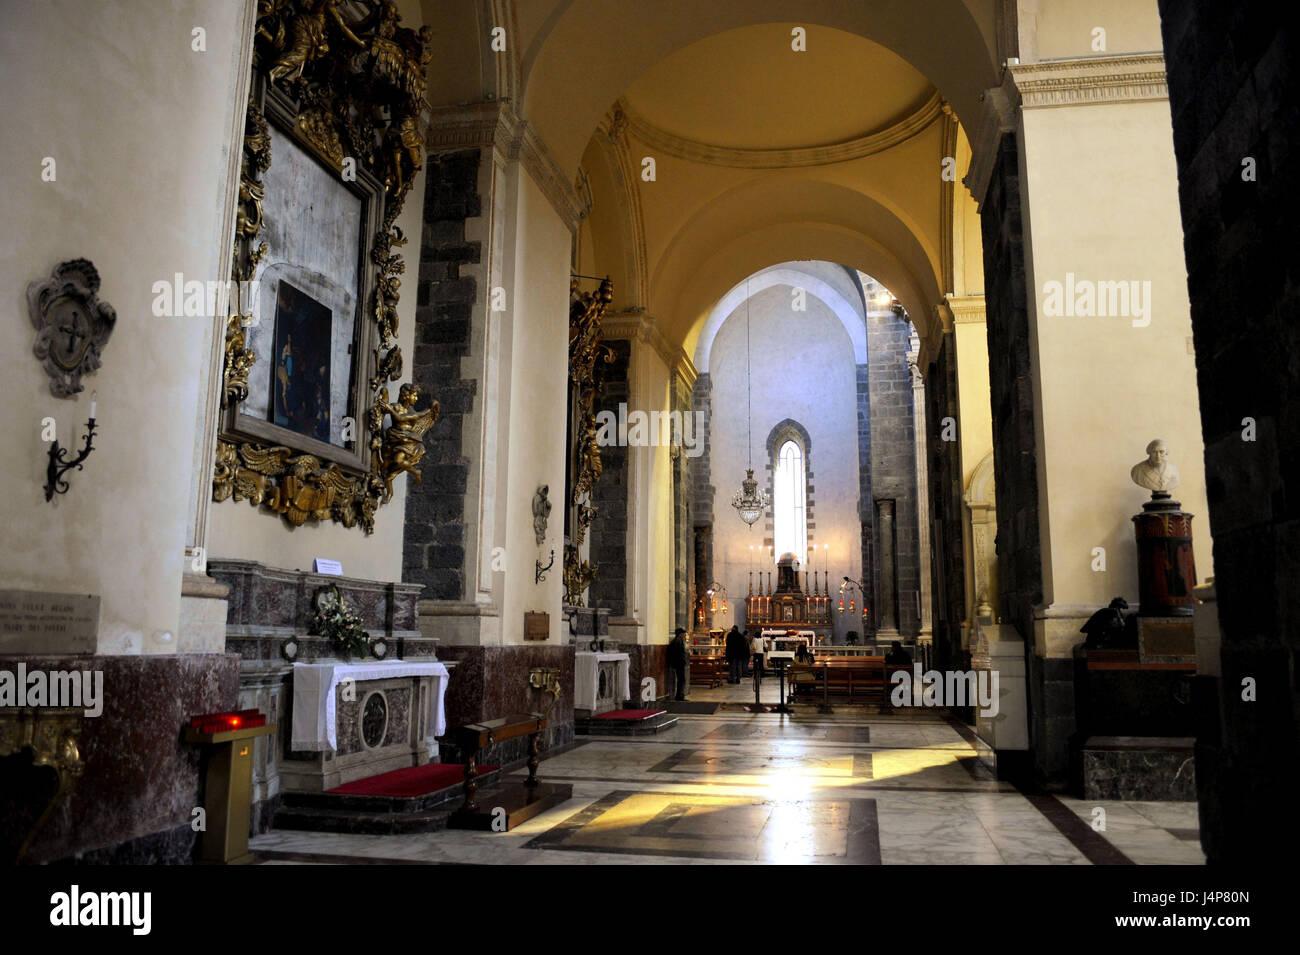 Cathedral interior catania sicily italy im genes de stock for La isla interior torrent